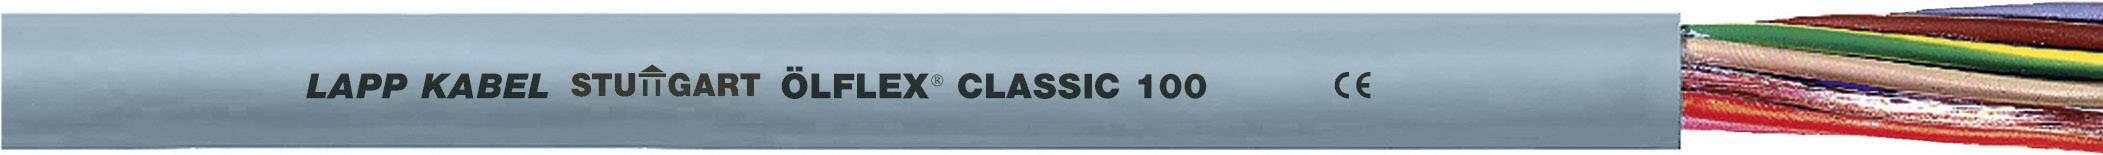 Kabel LappKabel Ölflex CLASSIC 100 4X0,5 (00101234), PVC, 5,7 mm, 500 V, šedá, 50 m